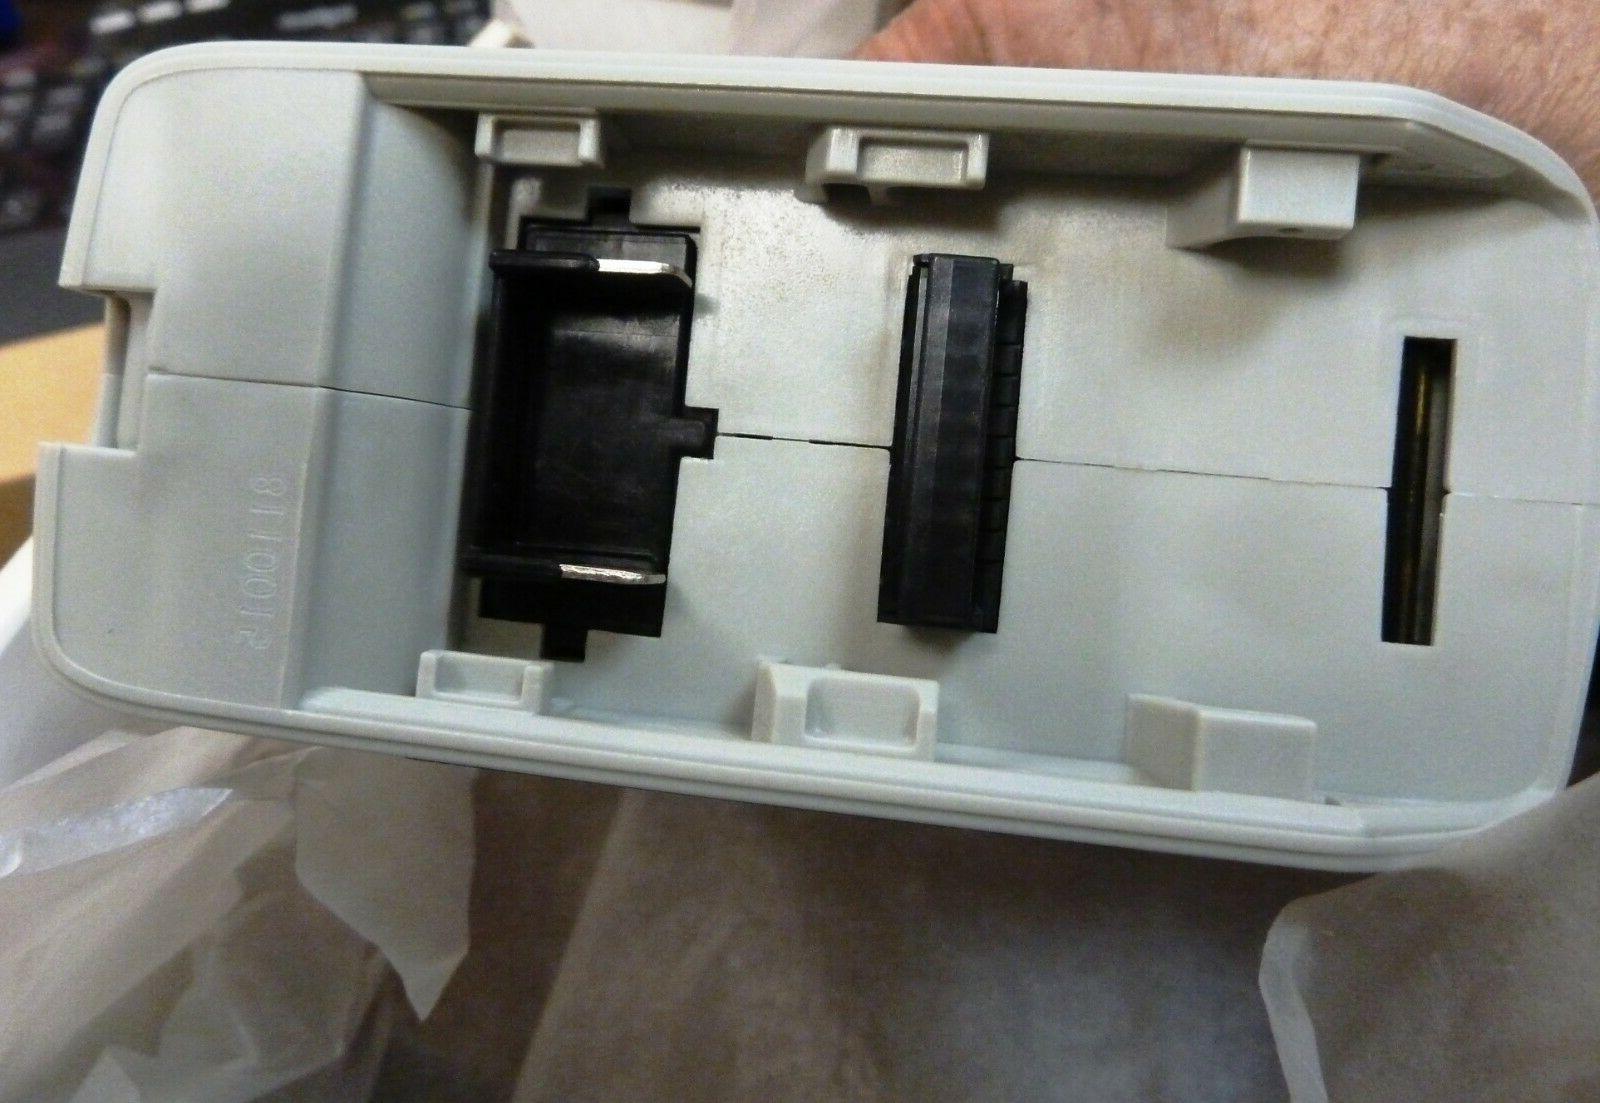 PANASONIC EY7460 Cordless Bare Tool, the Box